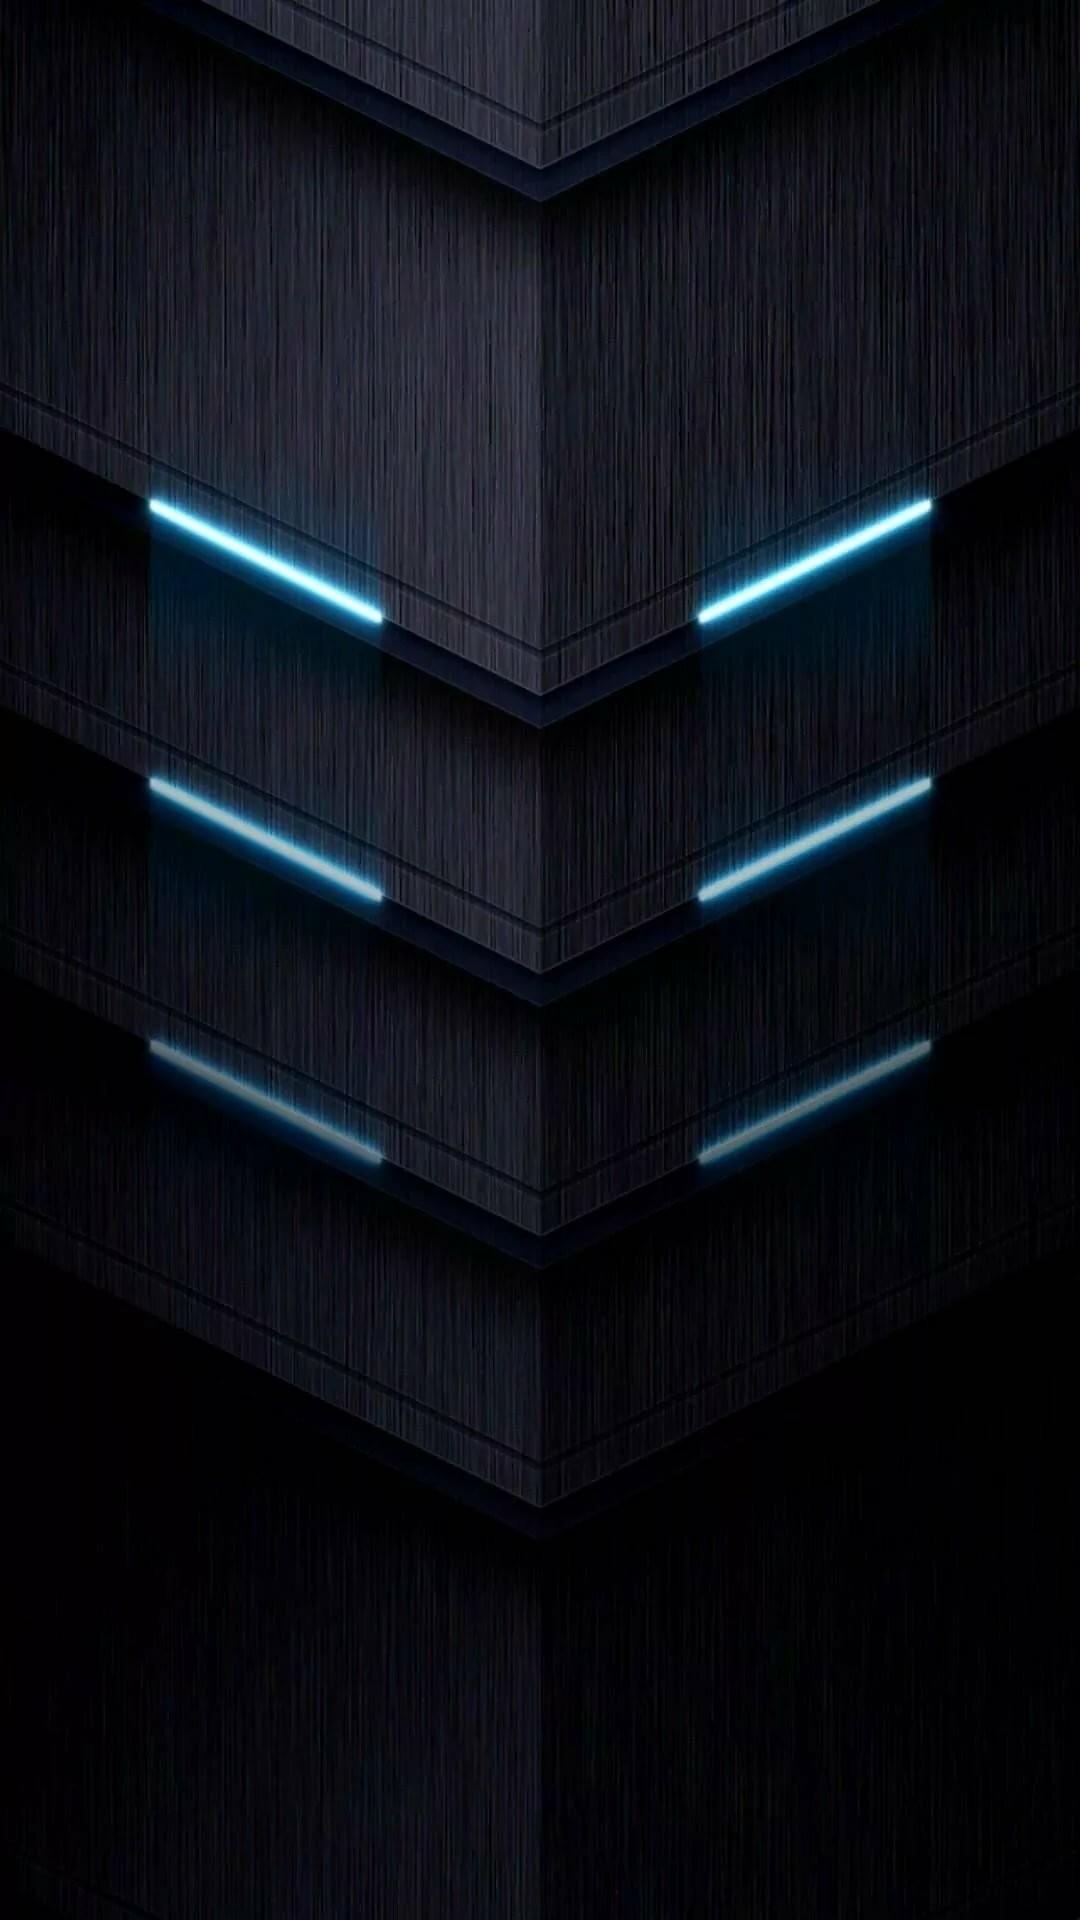 Neon wallpaper for iPhone